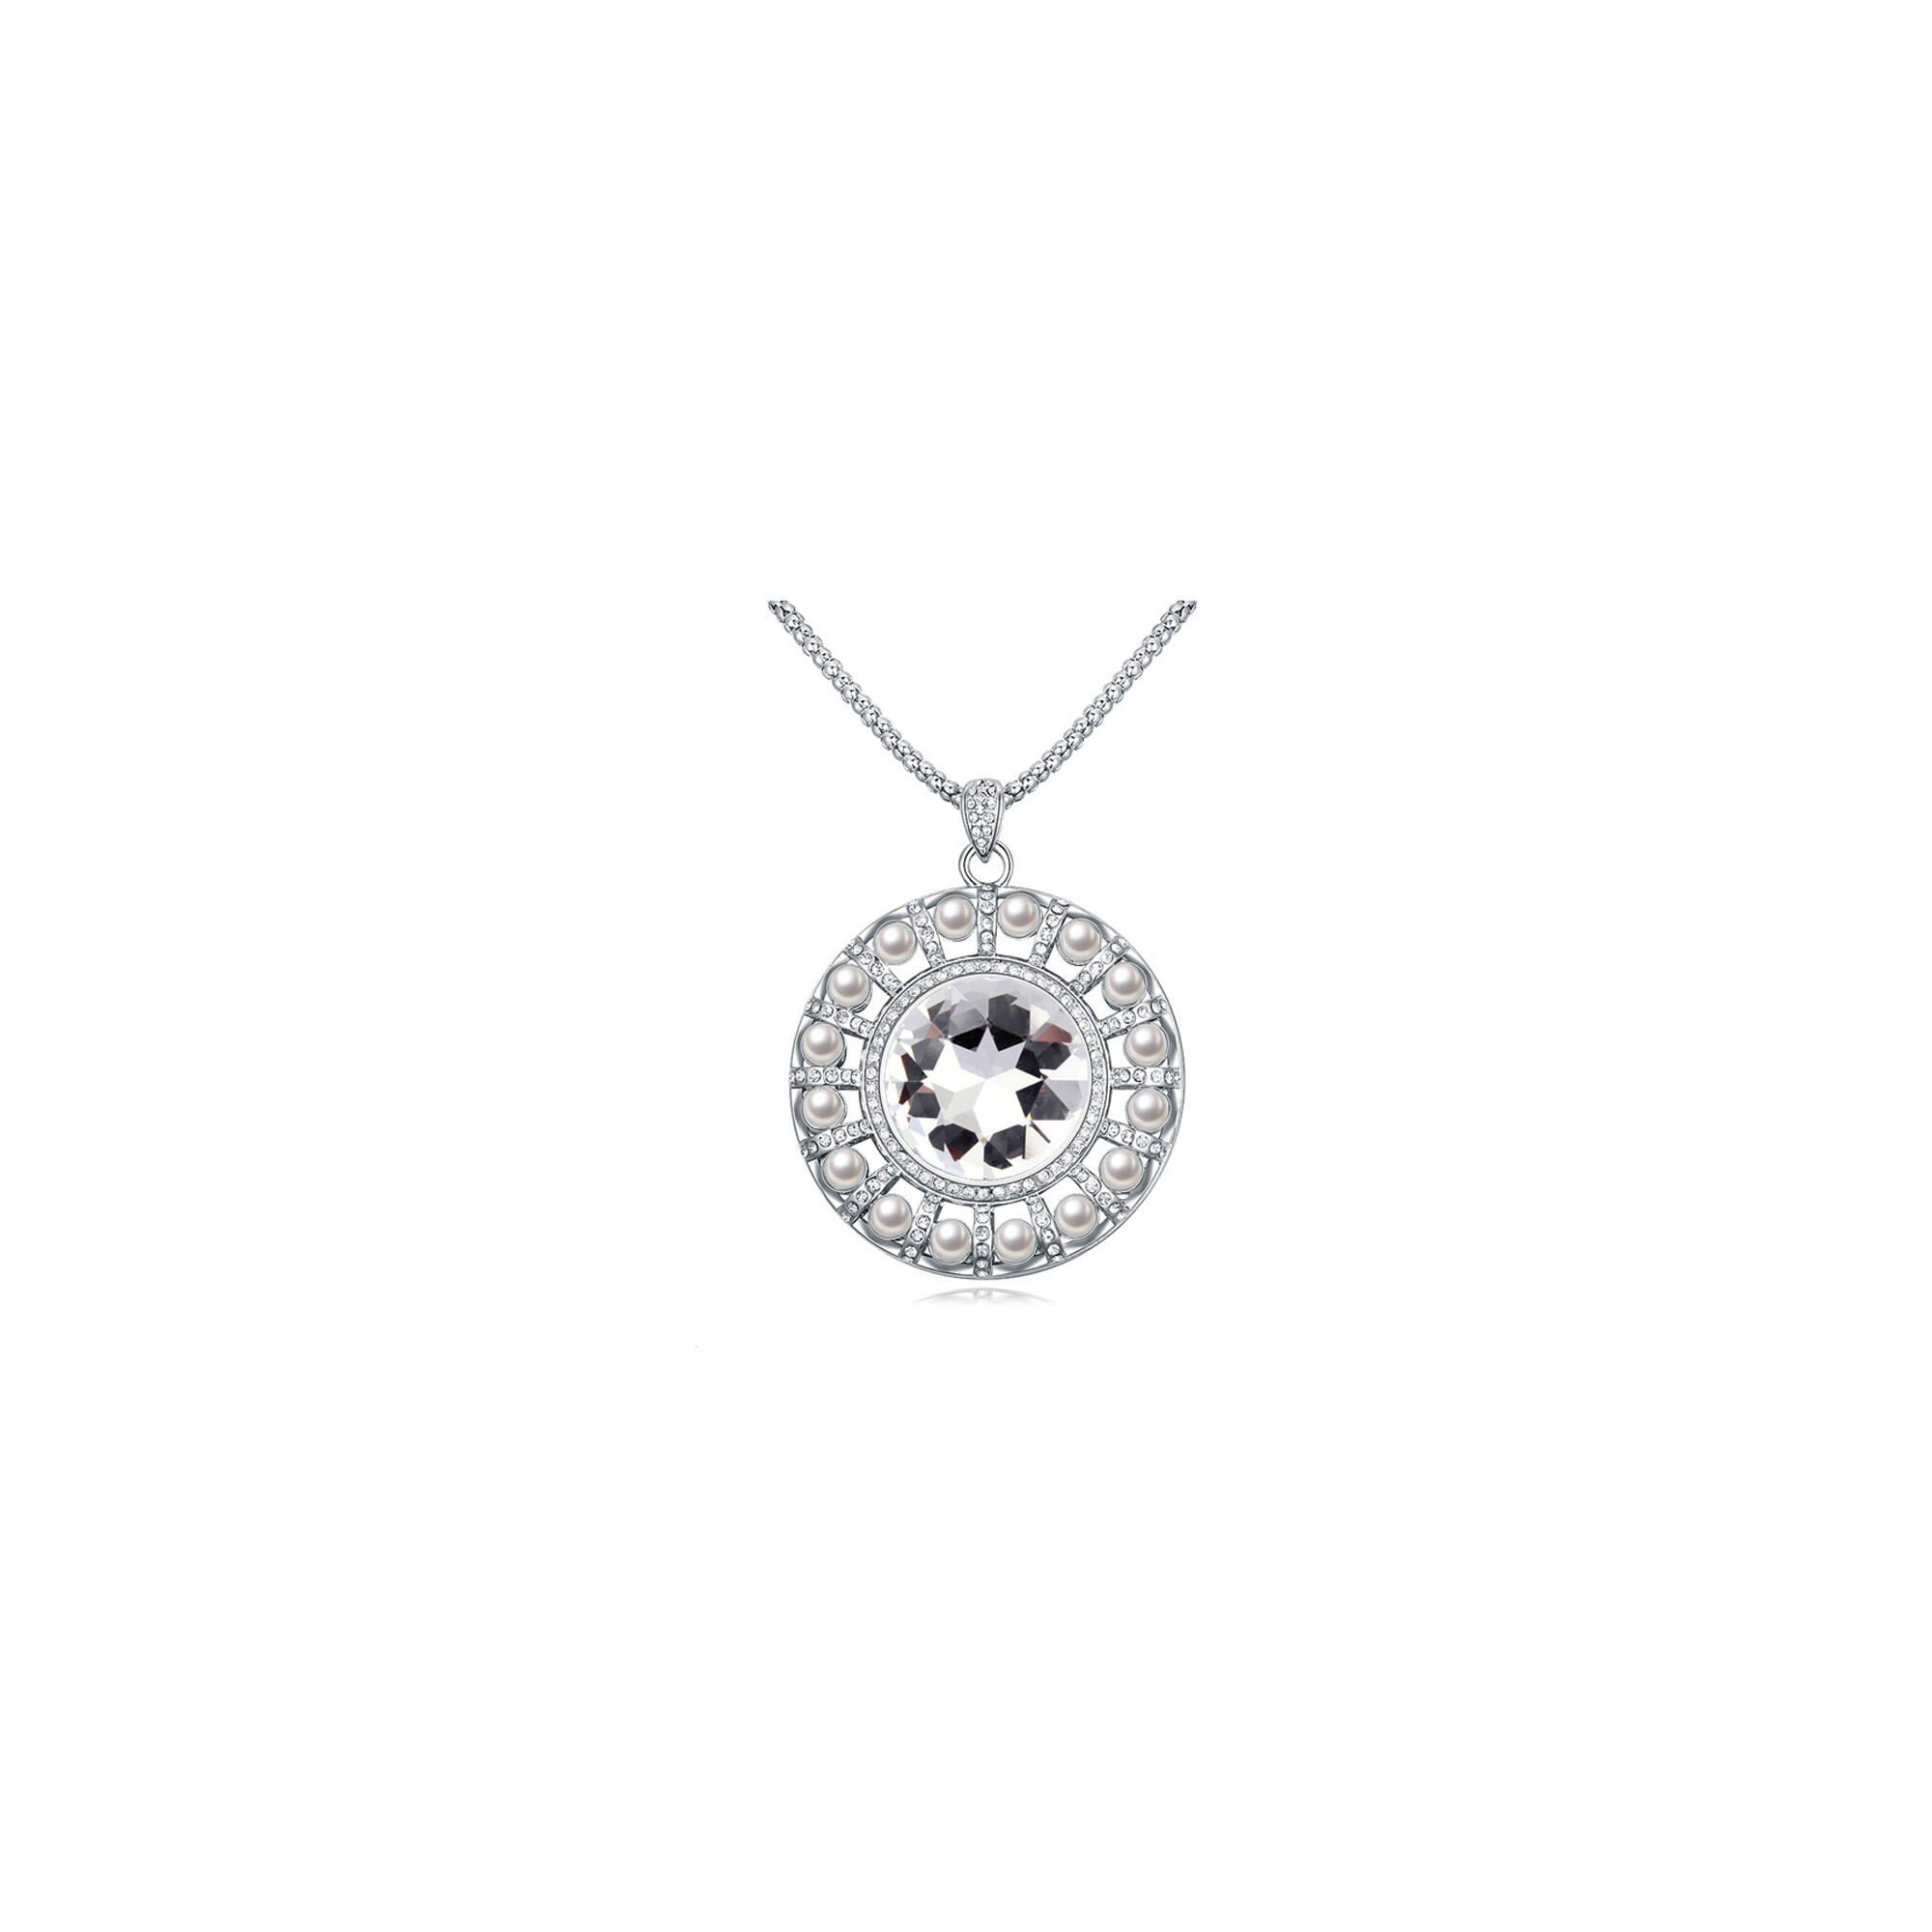 Gyémánt Swarovski medál nyaklánccal